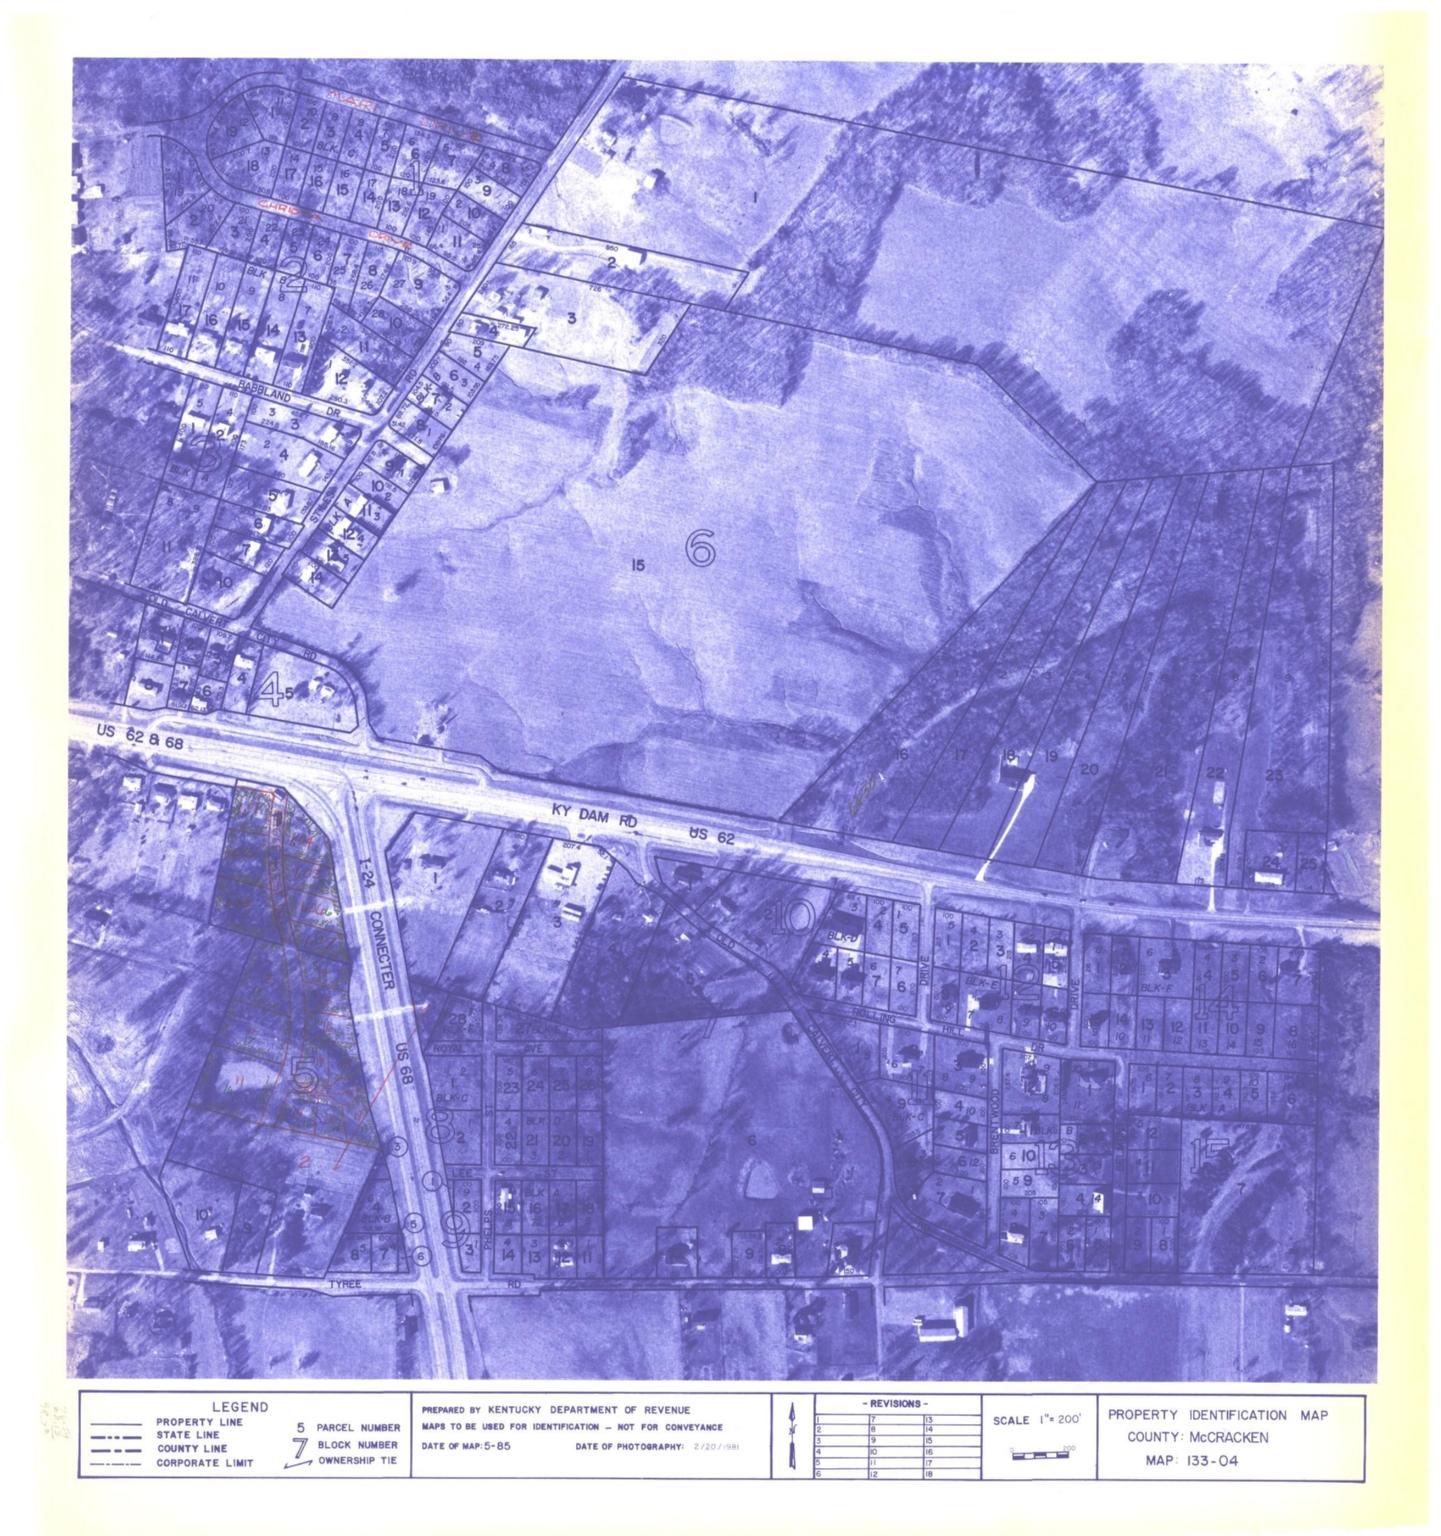 Property Identification Map McCracken County, Map 133-04